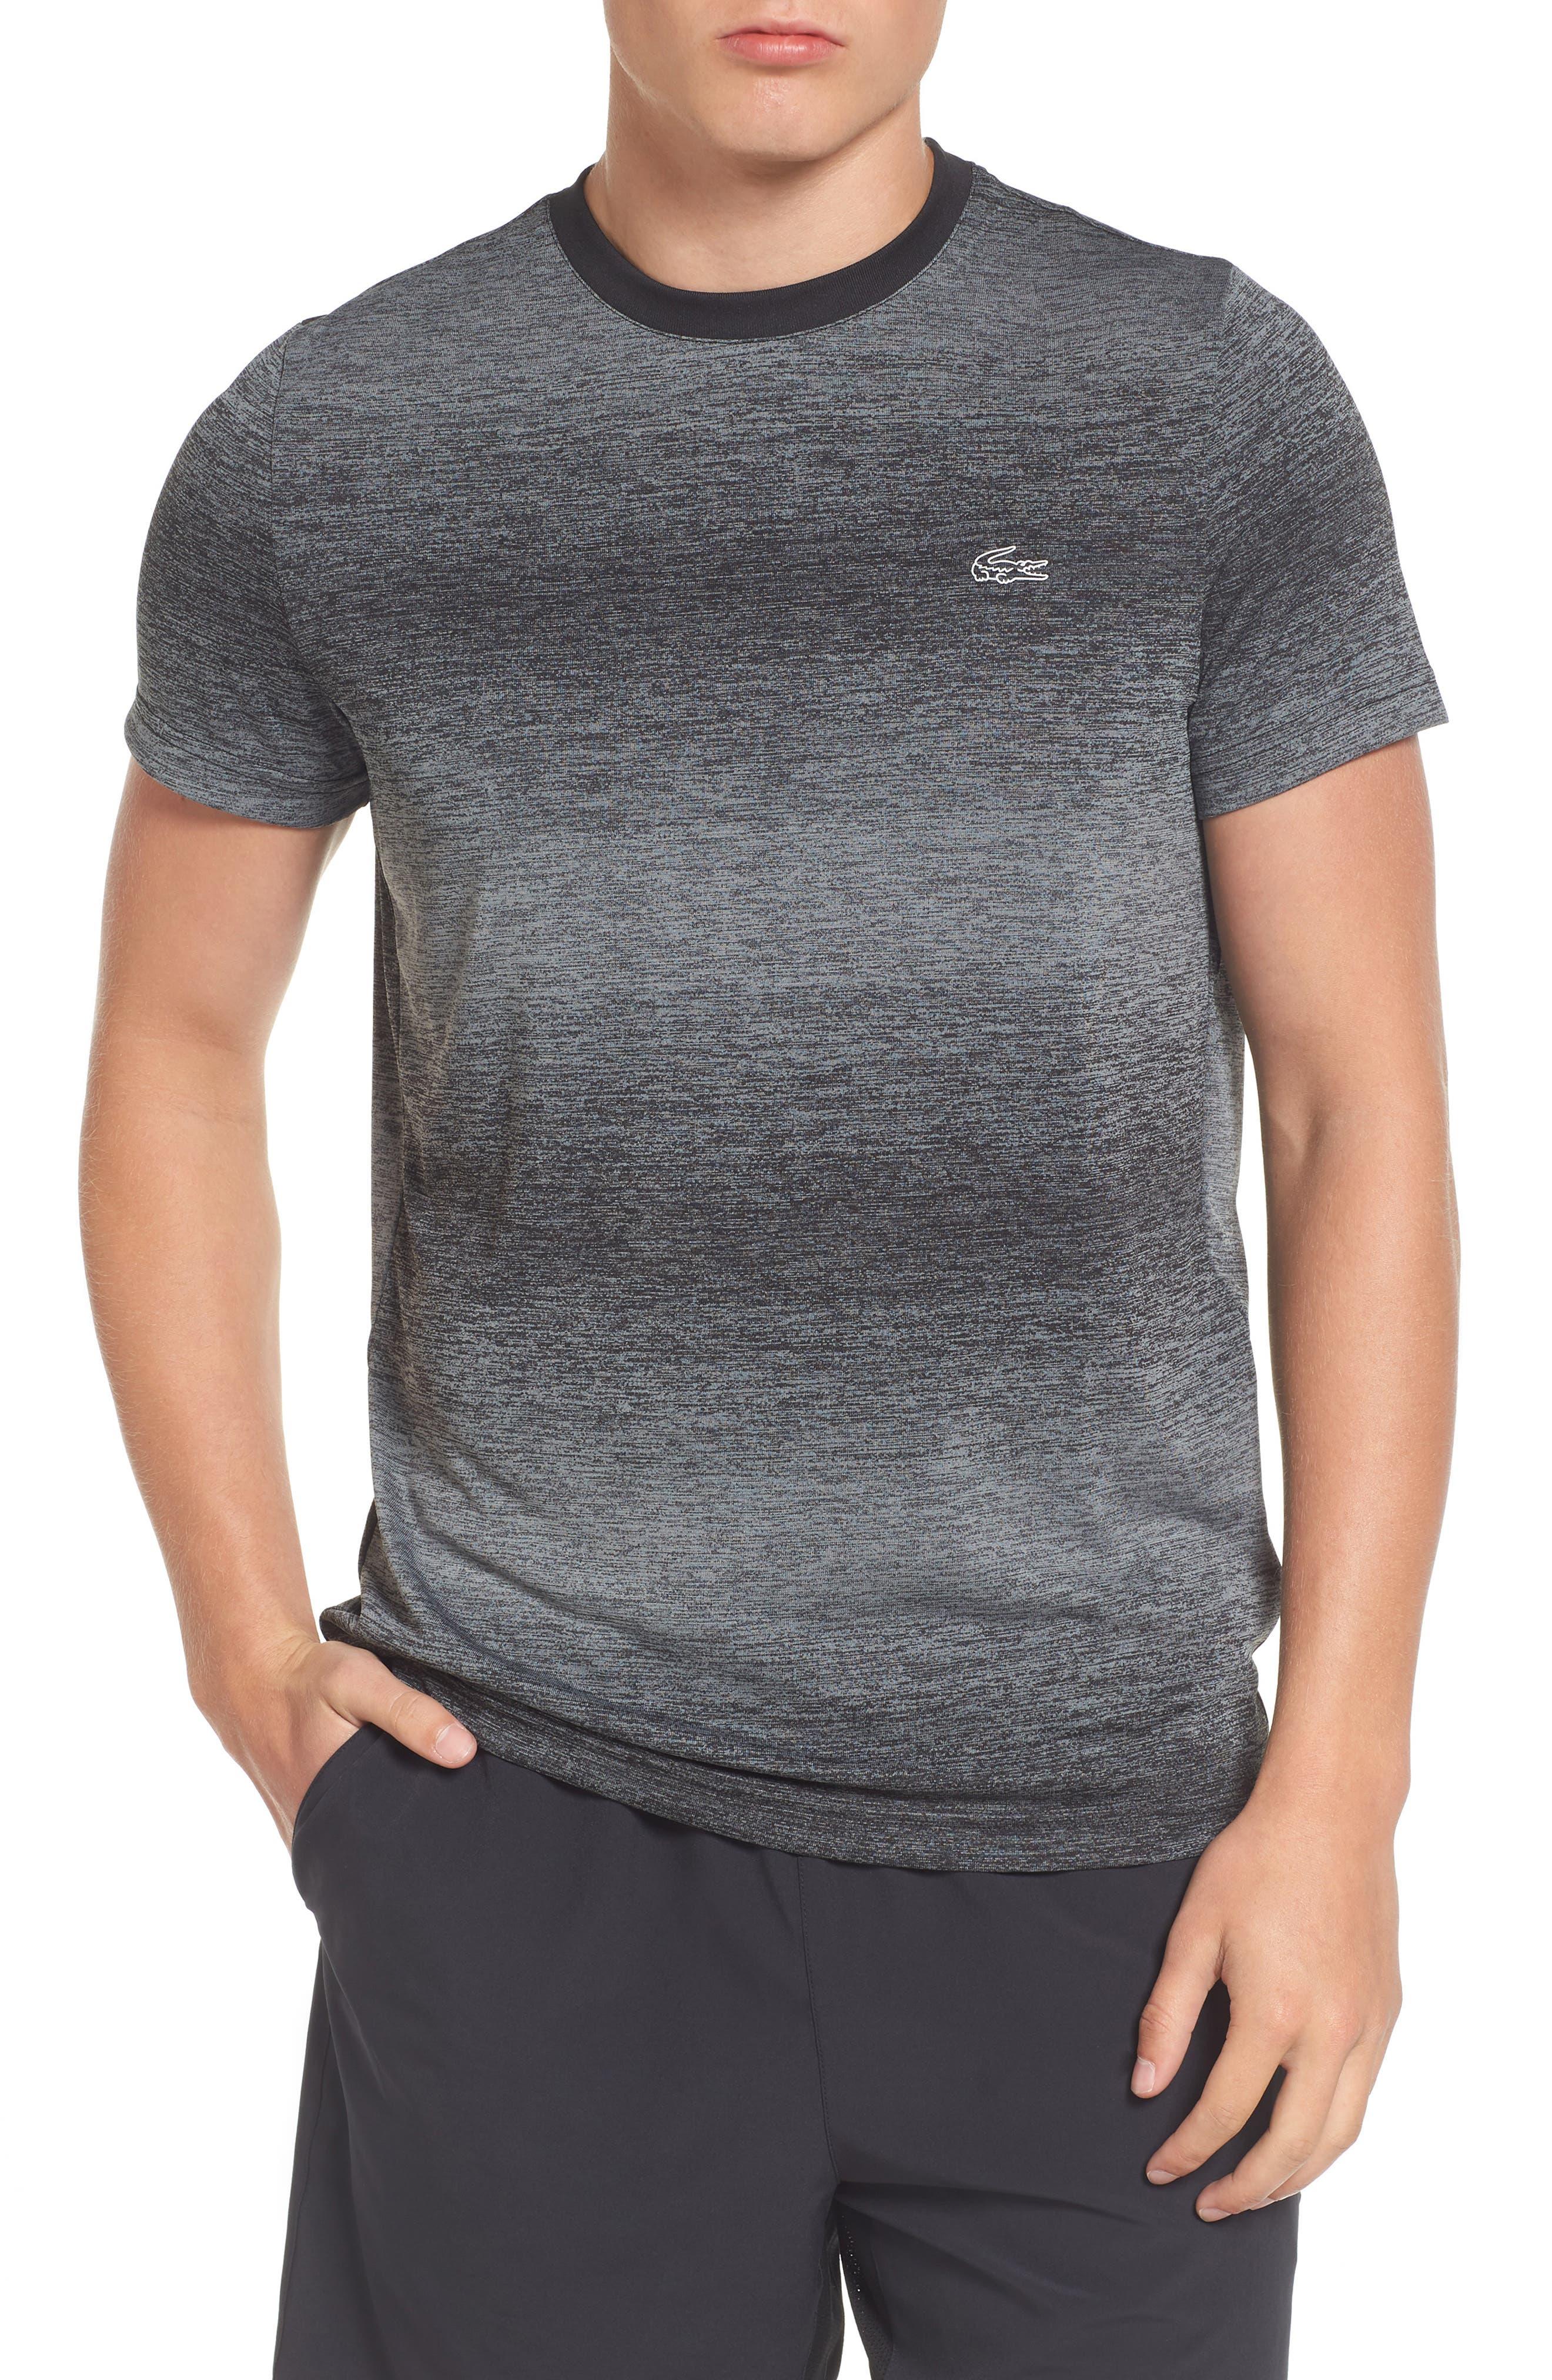 Ultra Dry Tech T-Shirt,                             Main thumbnail 1, color,                             007